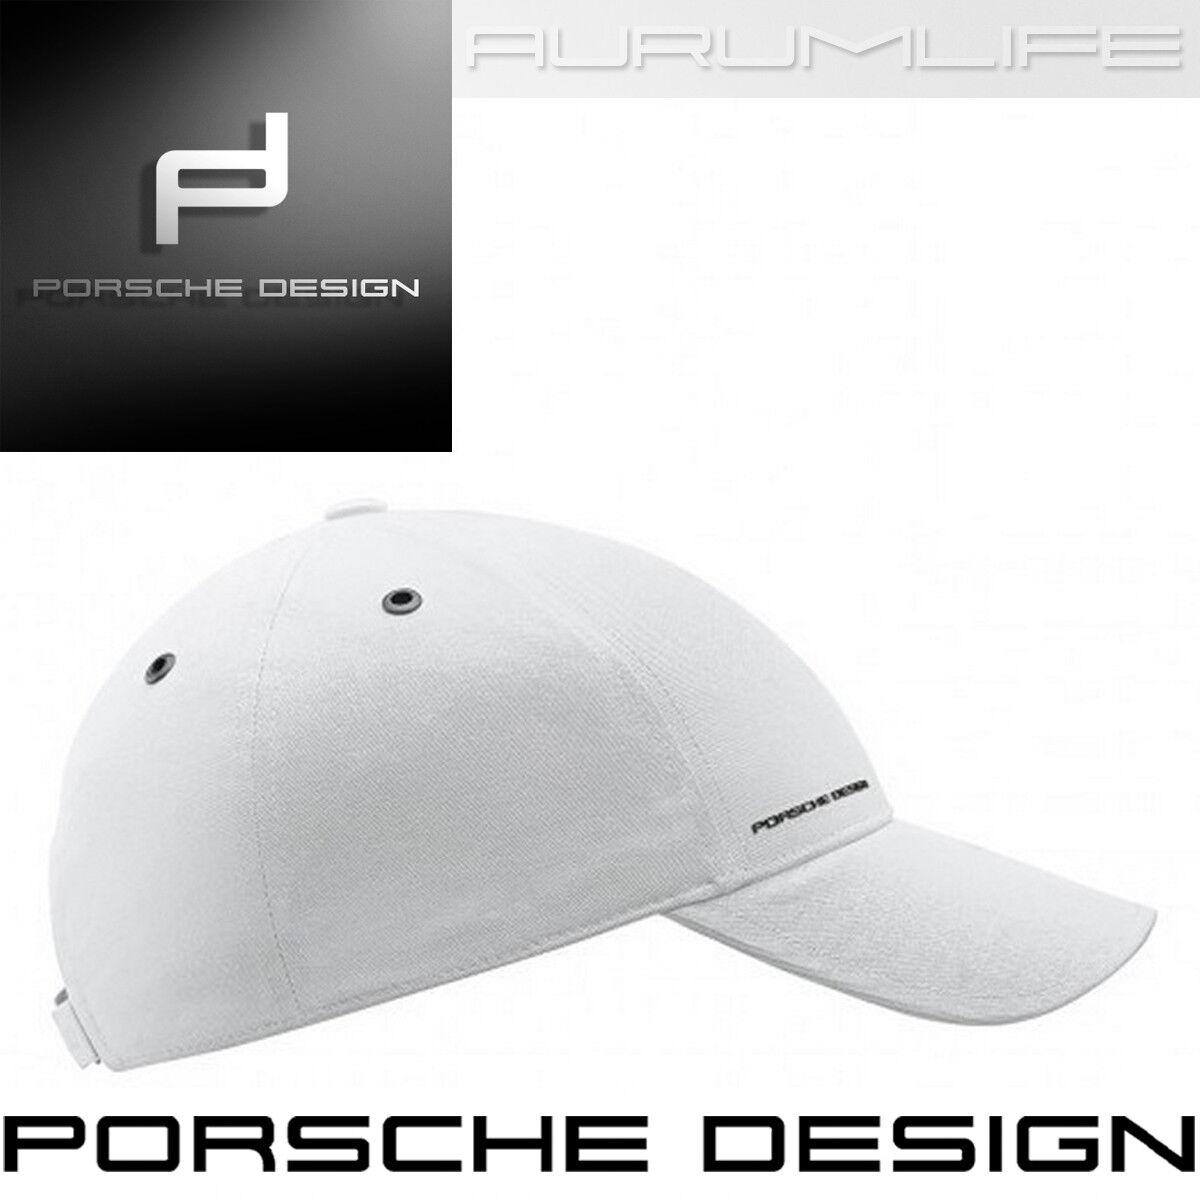 adidas Porsche Design Cap Classic Hat White Black Golf Originals ... a4d82080775b